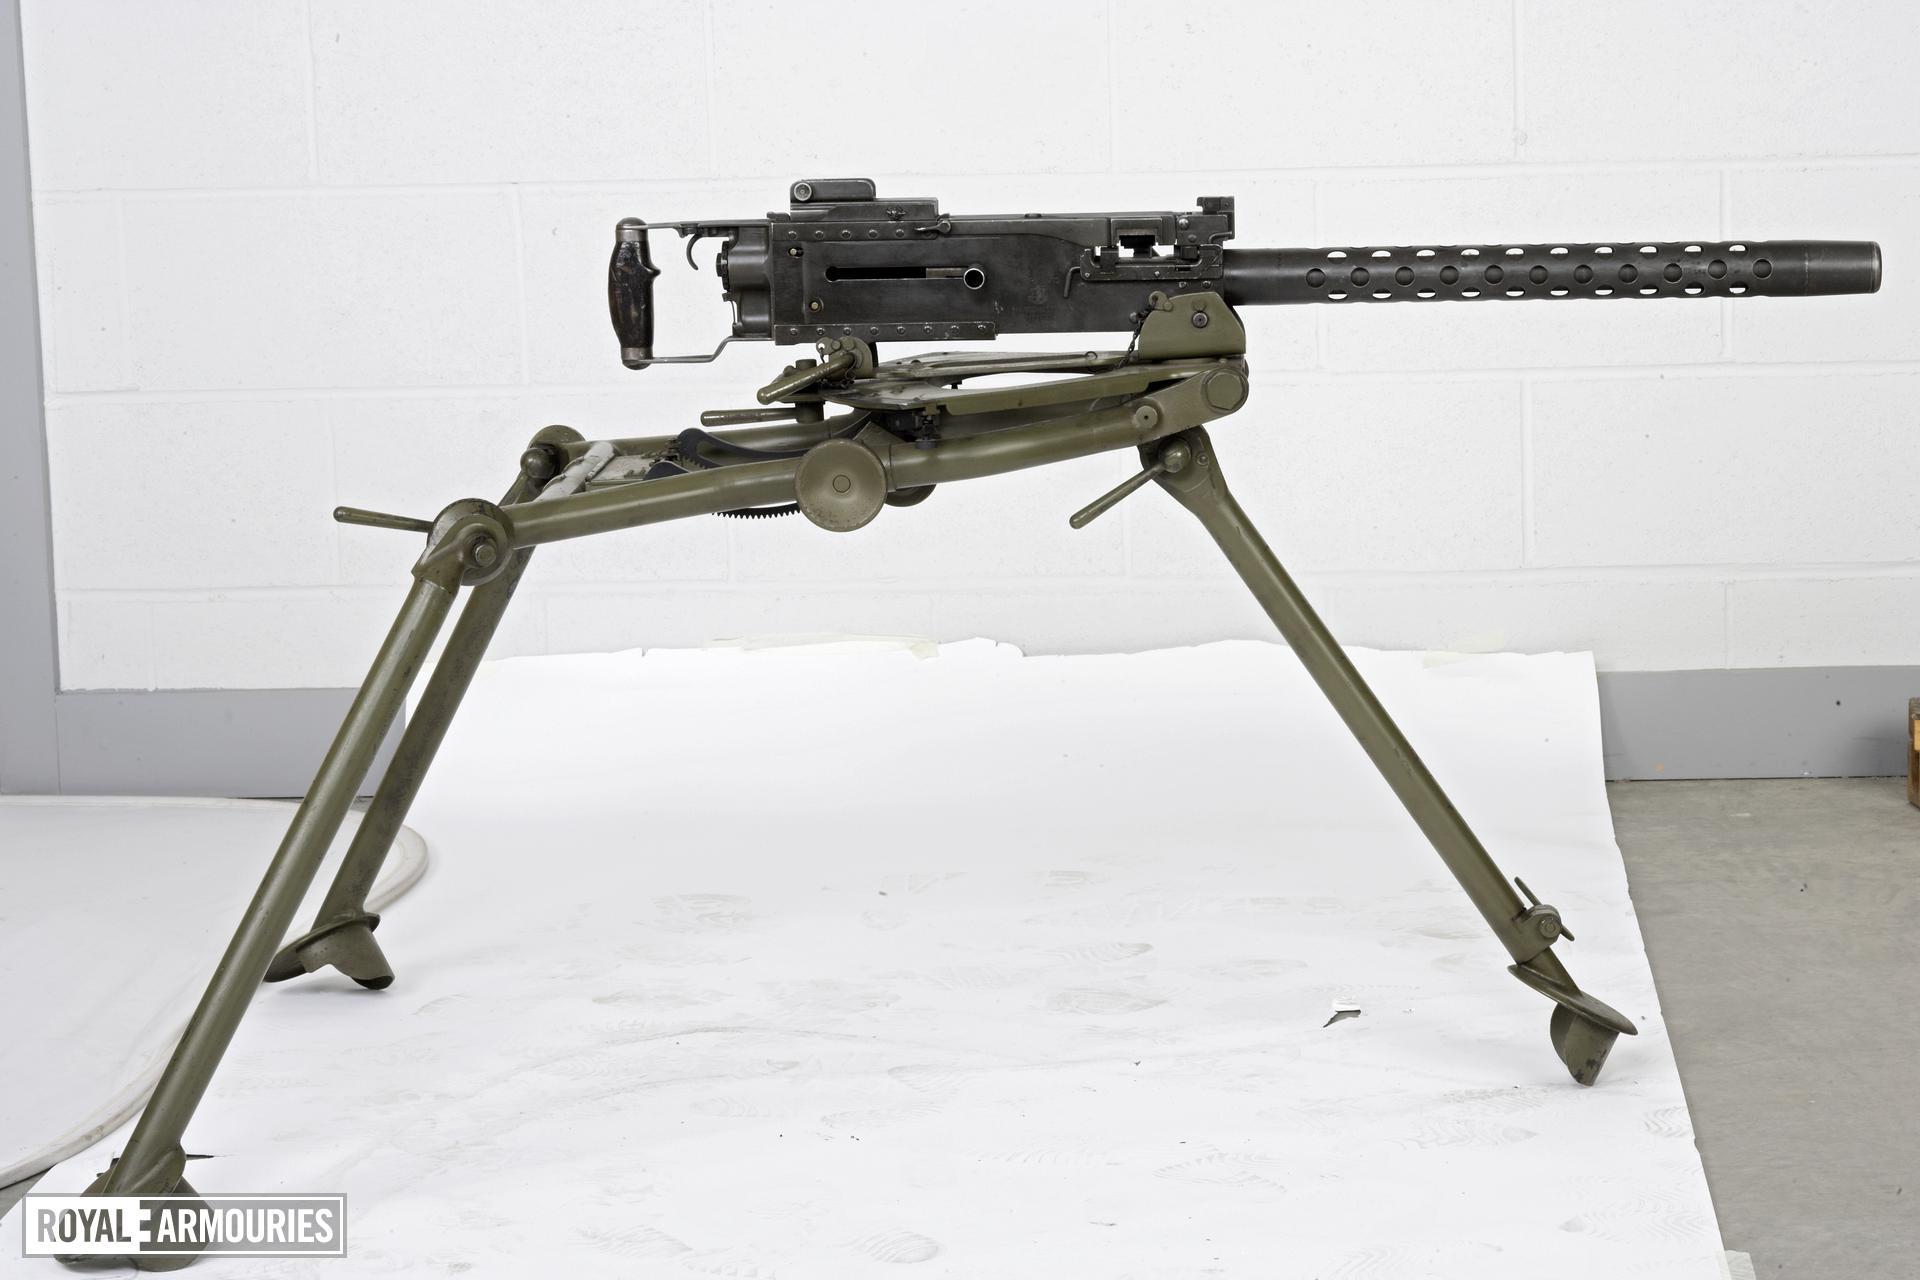 Centrefire automatic machine gun - Browning